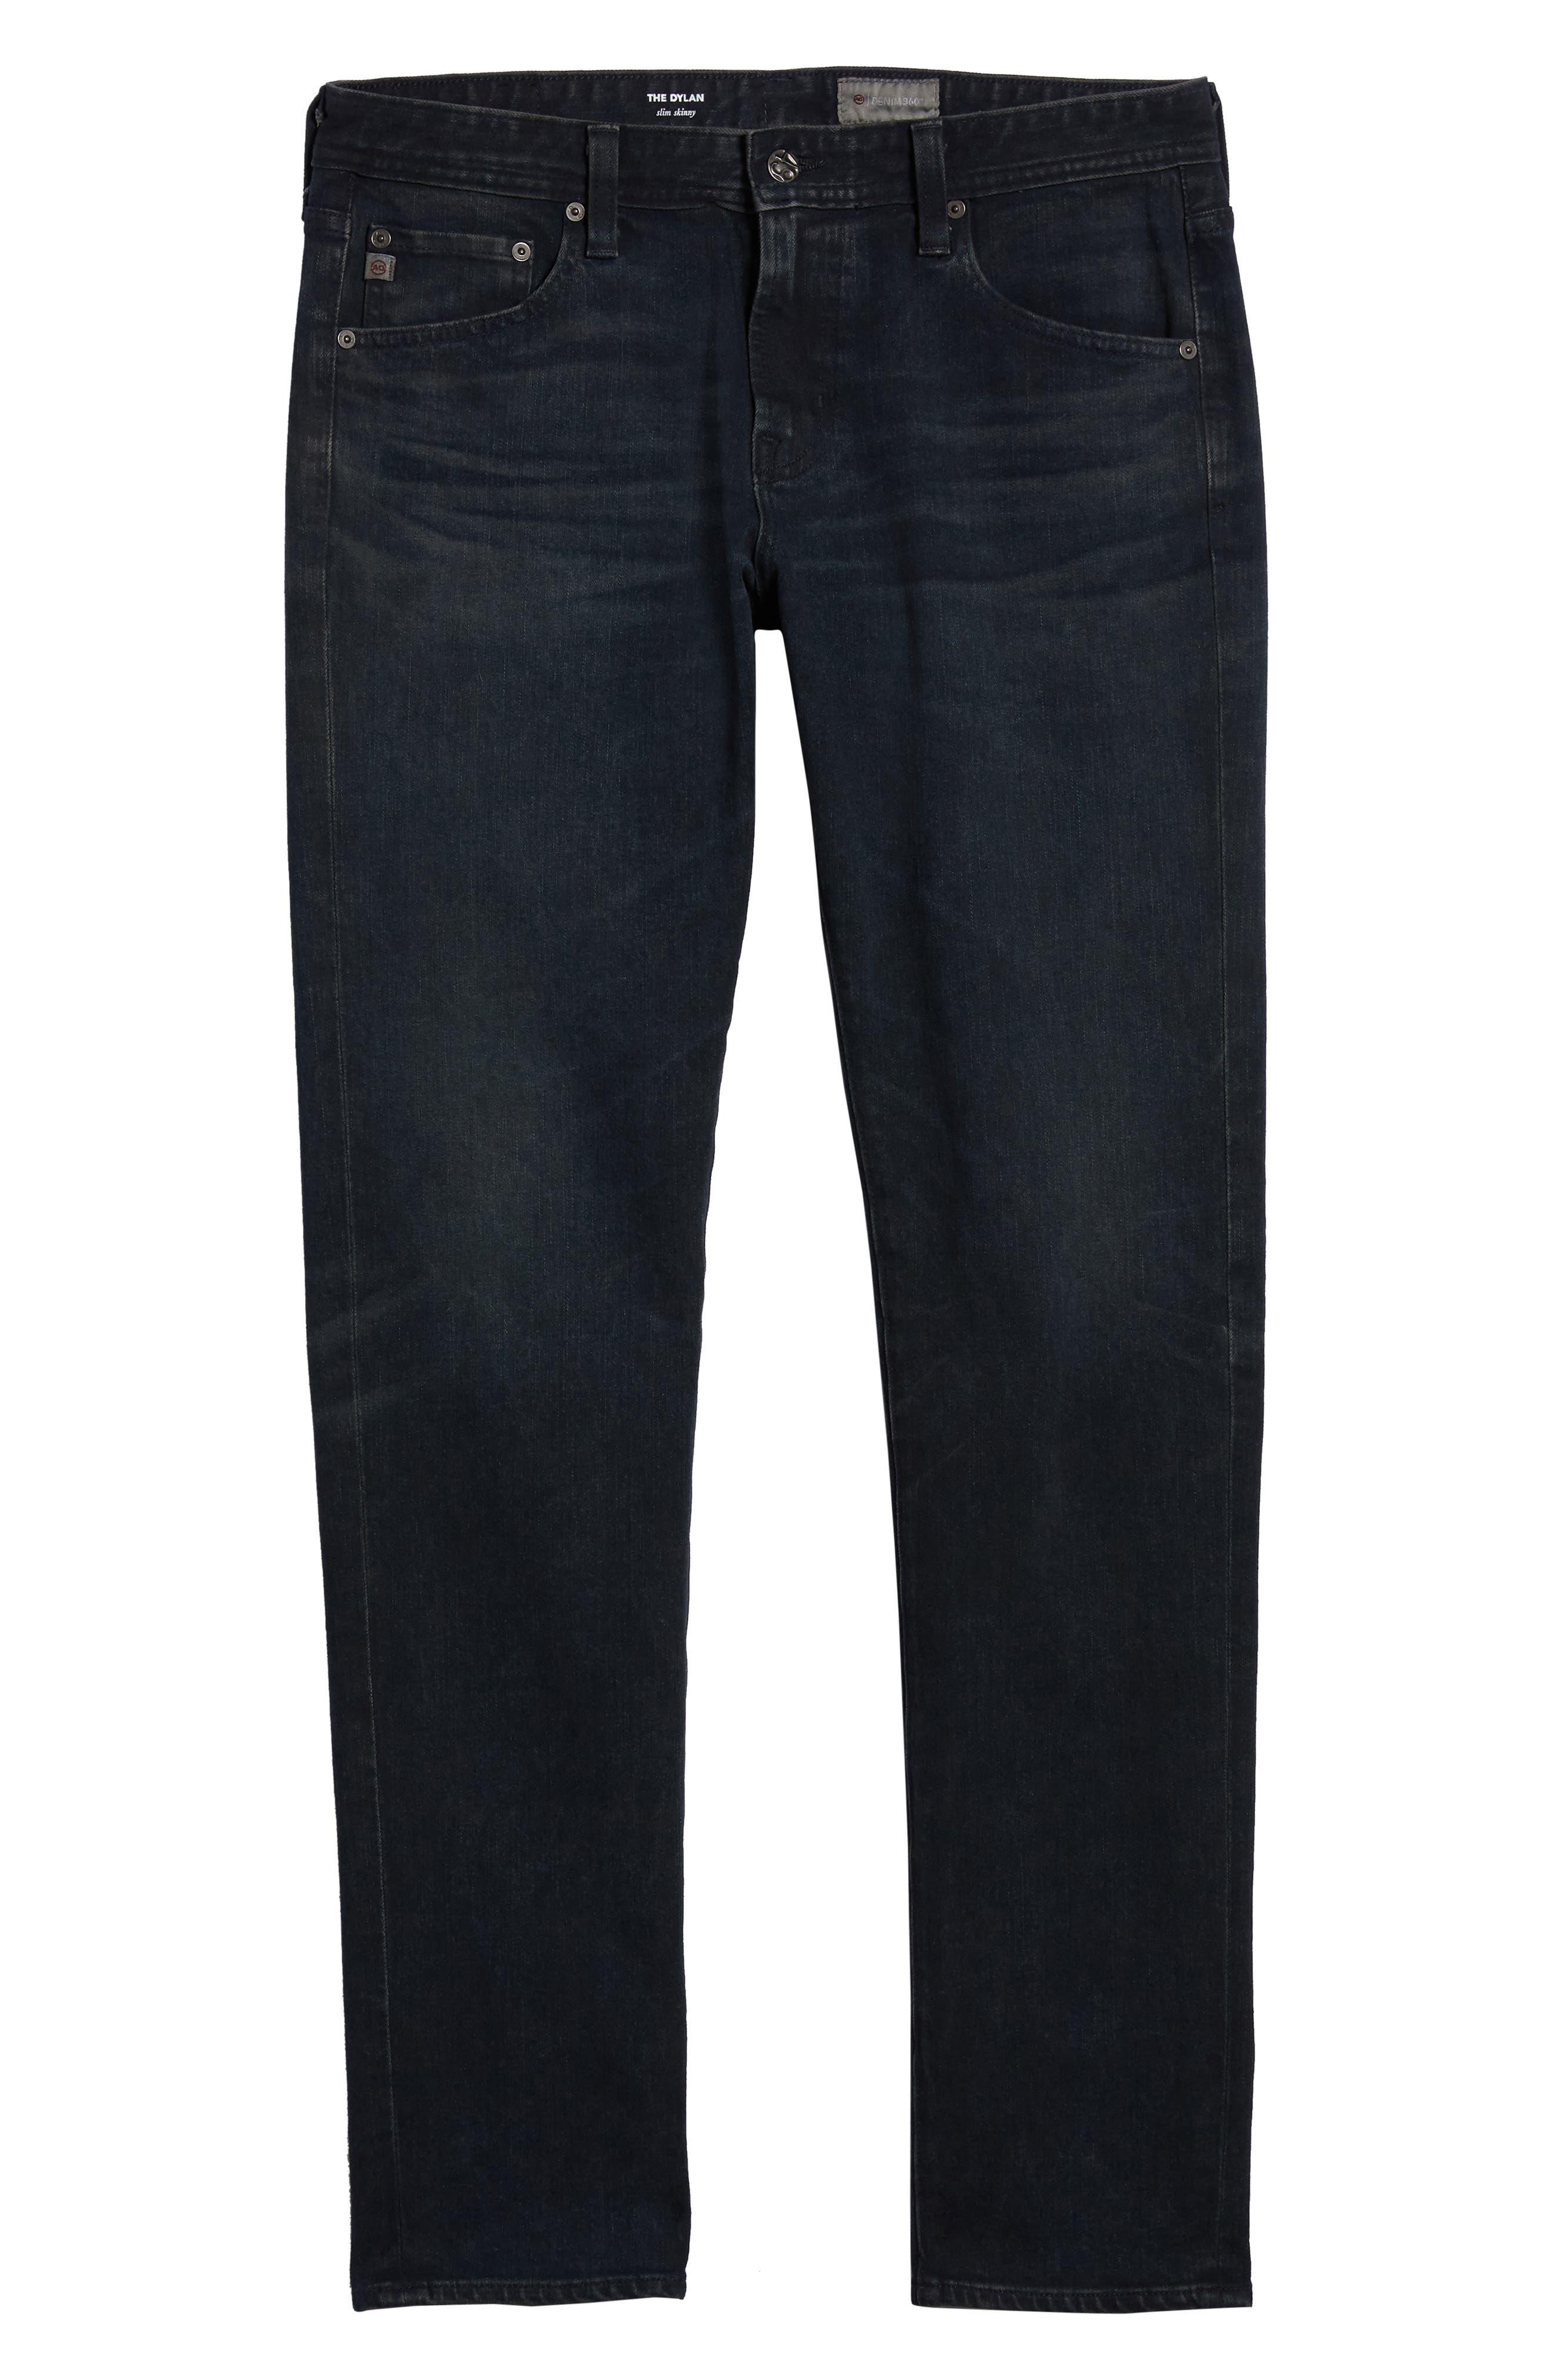 Dylan Skinny Jeans,                             Alternate thumbnail 6, color,                             019